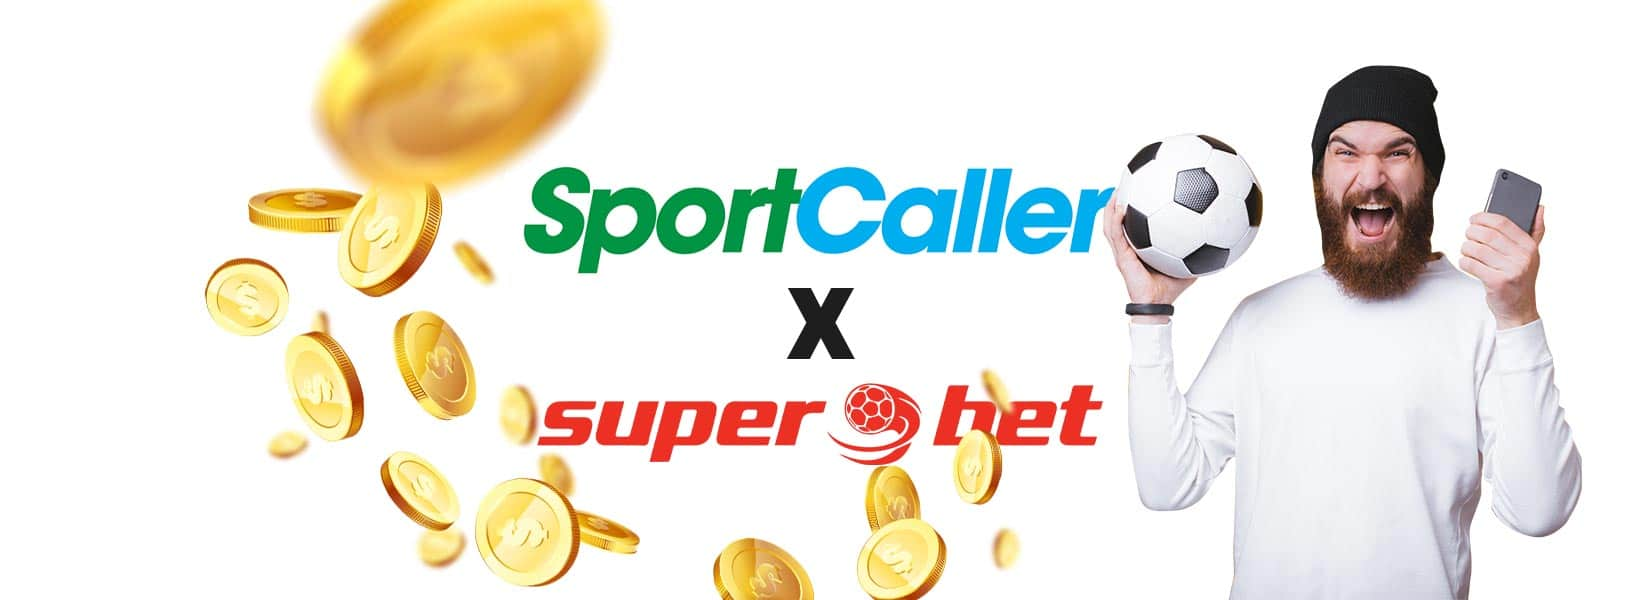 Sportcaller